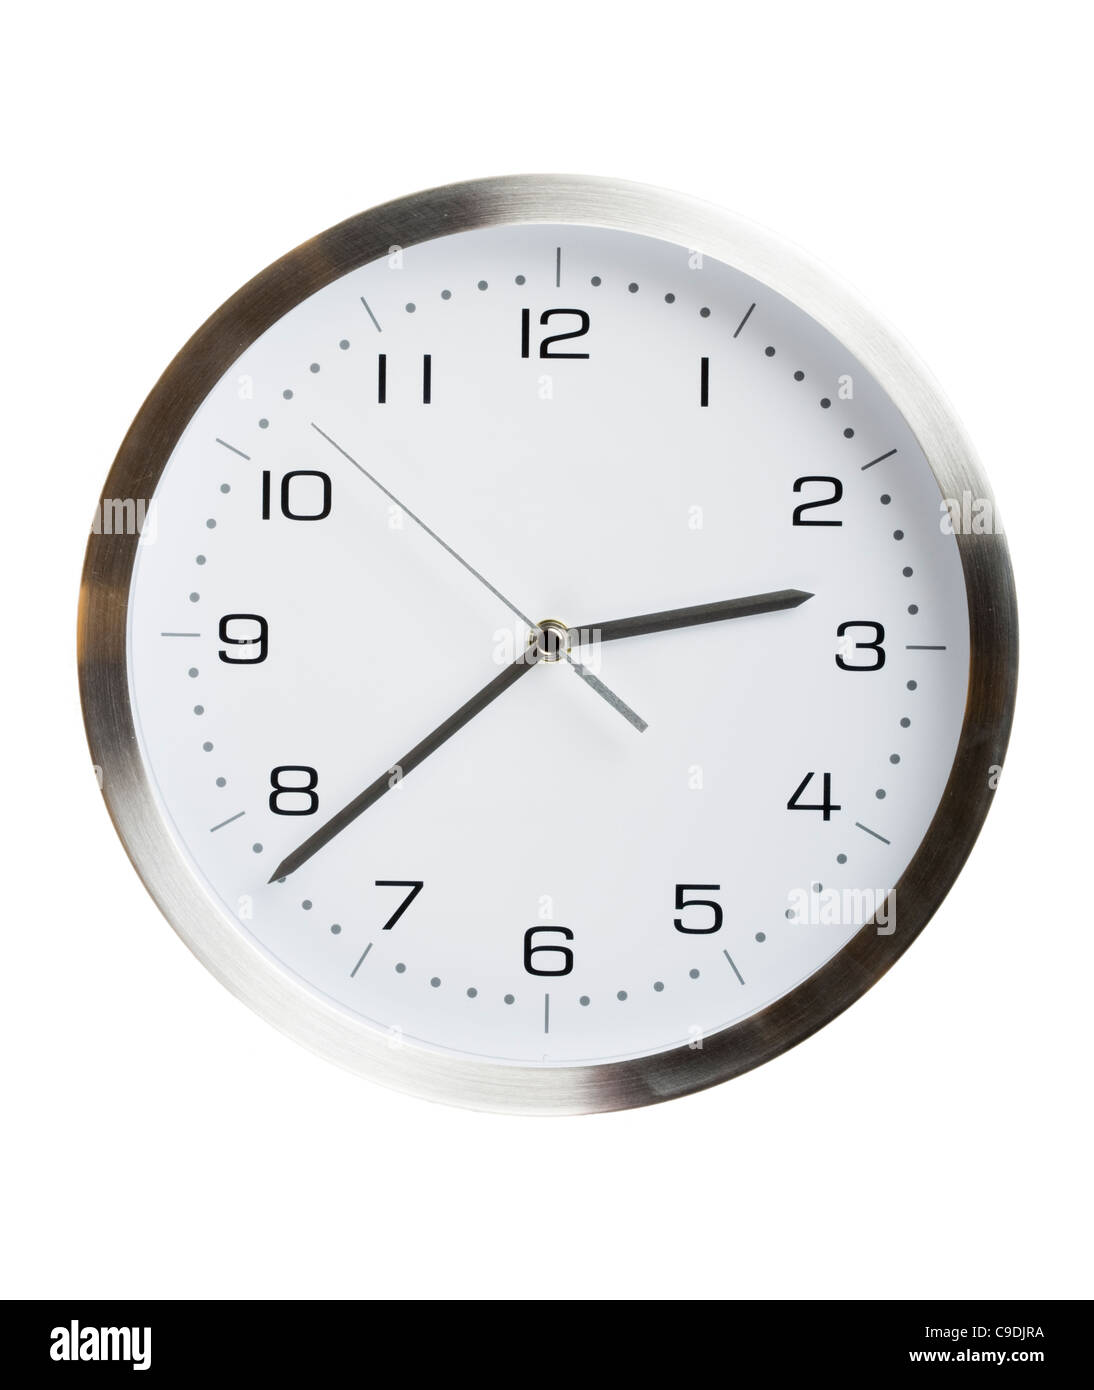 Horloge de cuisine. Photo Stock